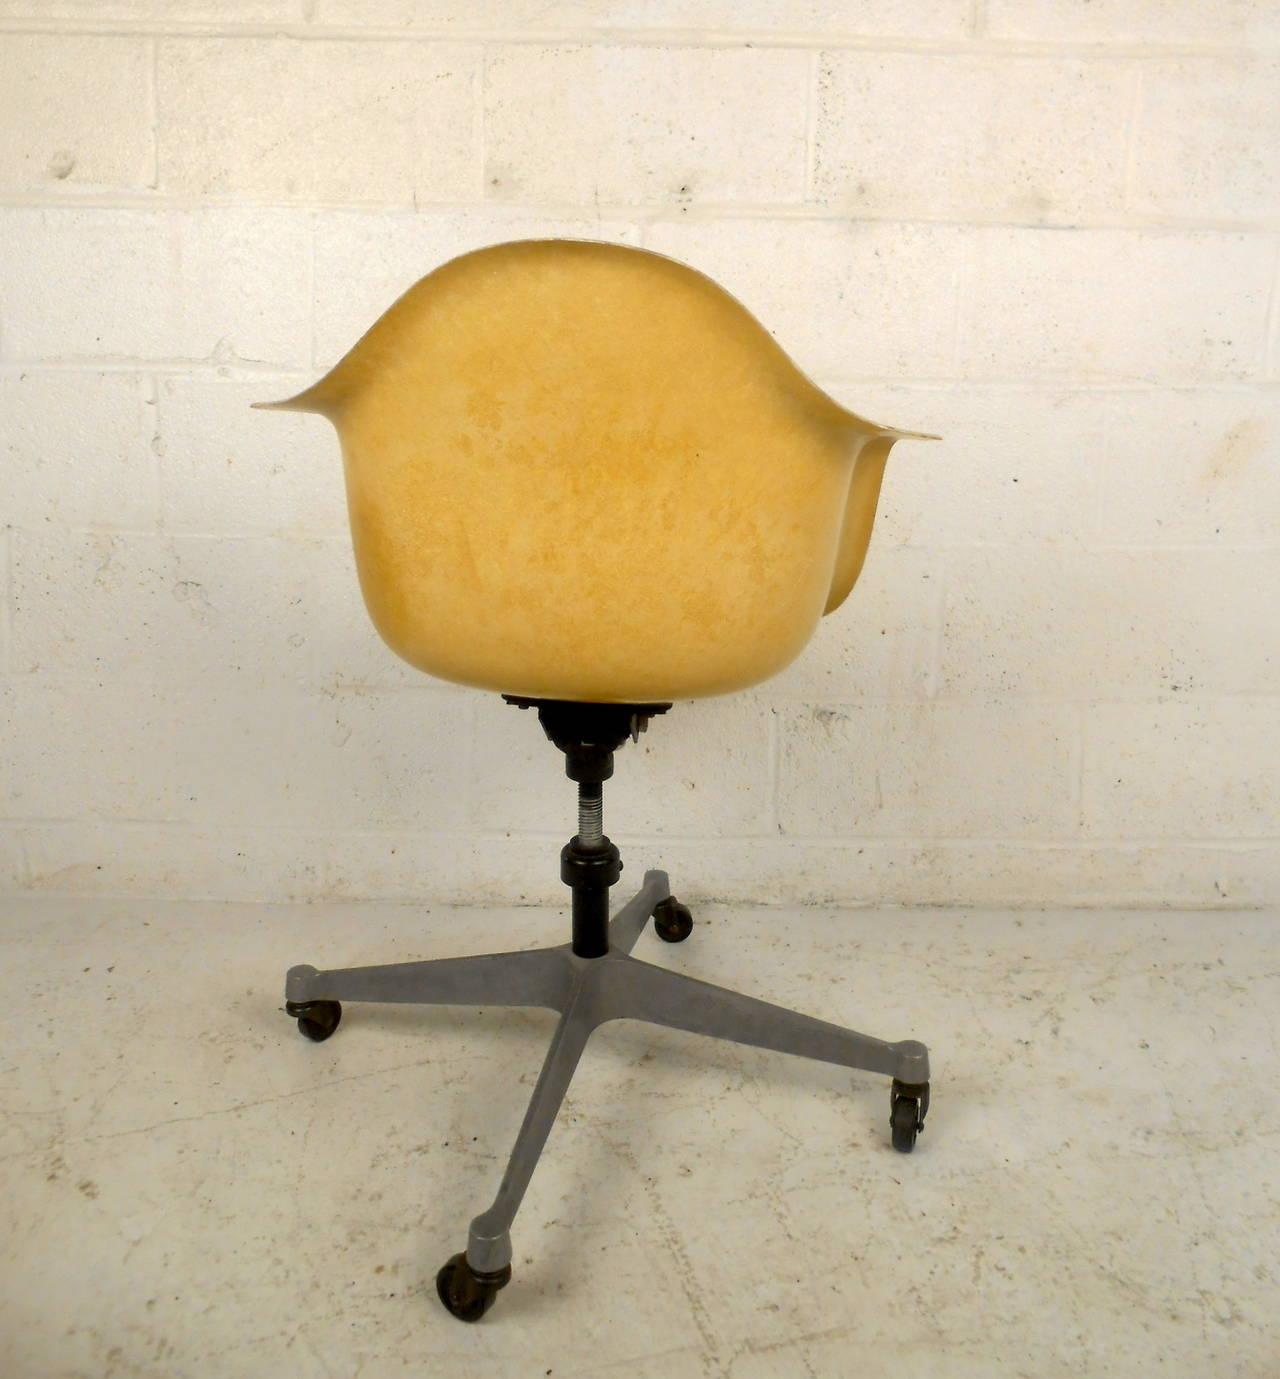 fiberglass shell chair wooden eddie bauer high mid century modern with wheels by